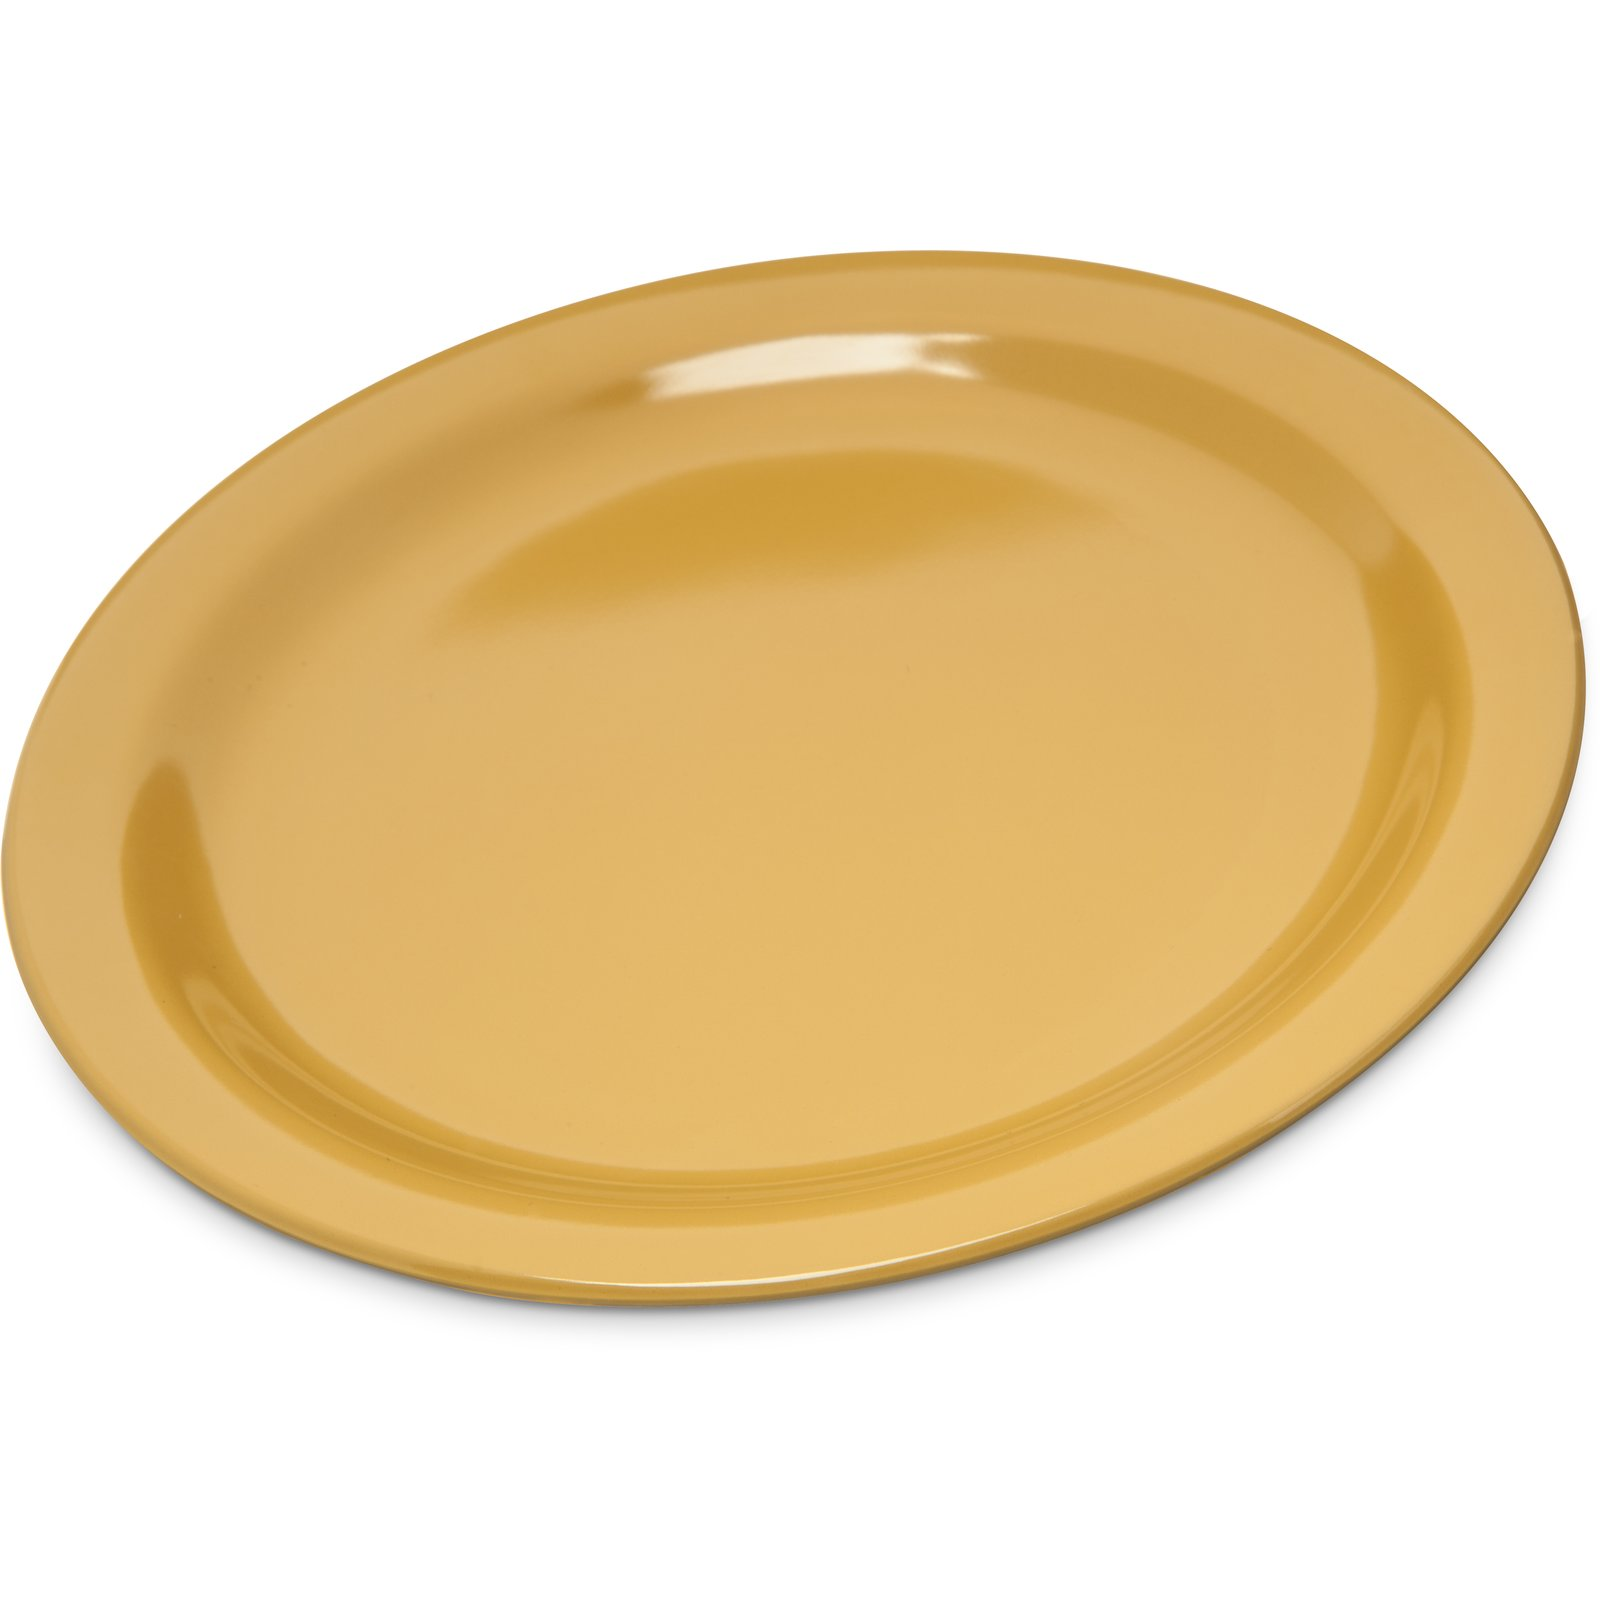 4350122 - Dallas Ware® Melamine Dinner Plate 9  - Honey Yellow  sc 1 st  Carlisle FoodService Products & 4350122 - Dallas Ware® Melamine Dinner Plate 9